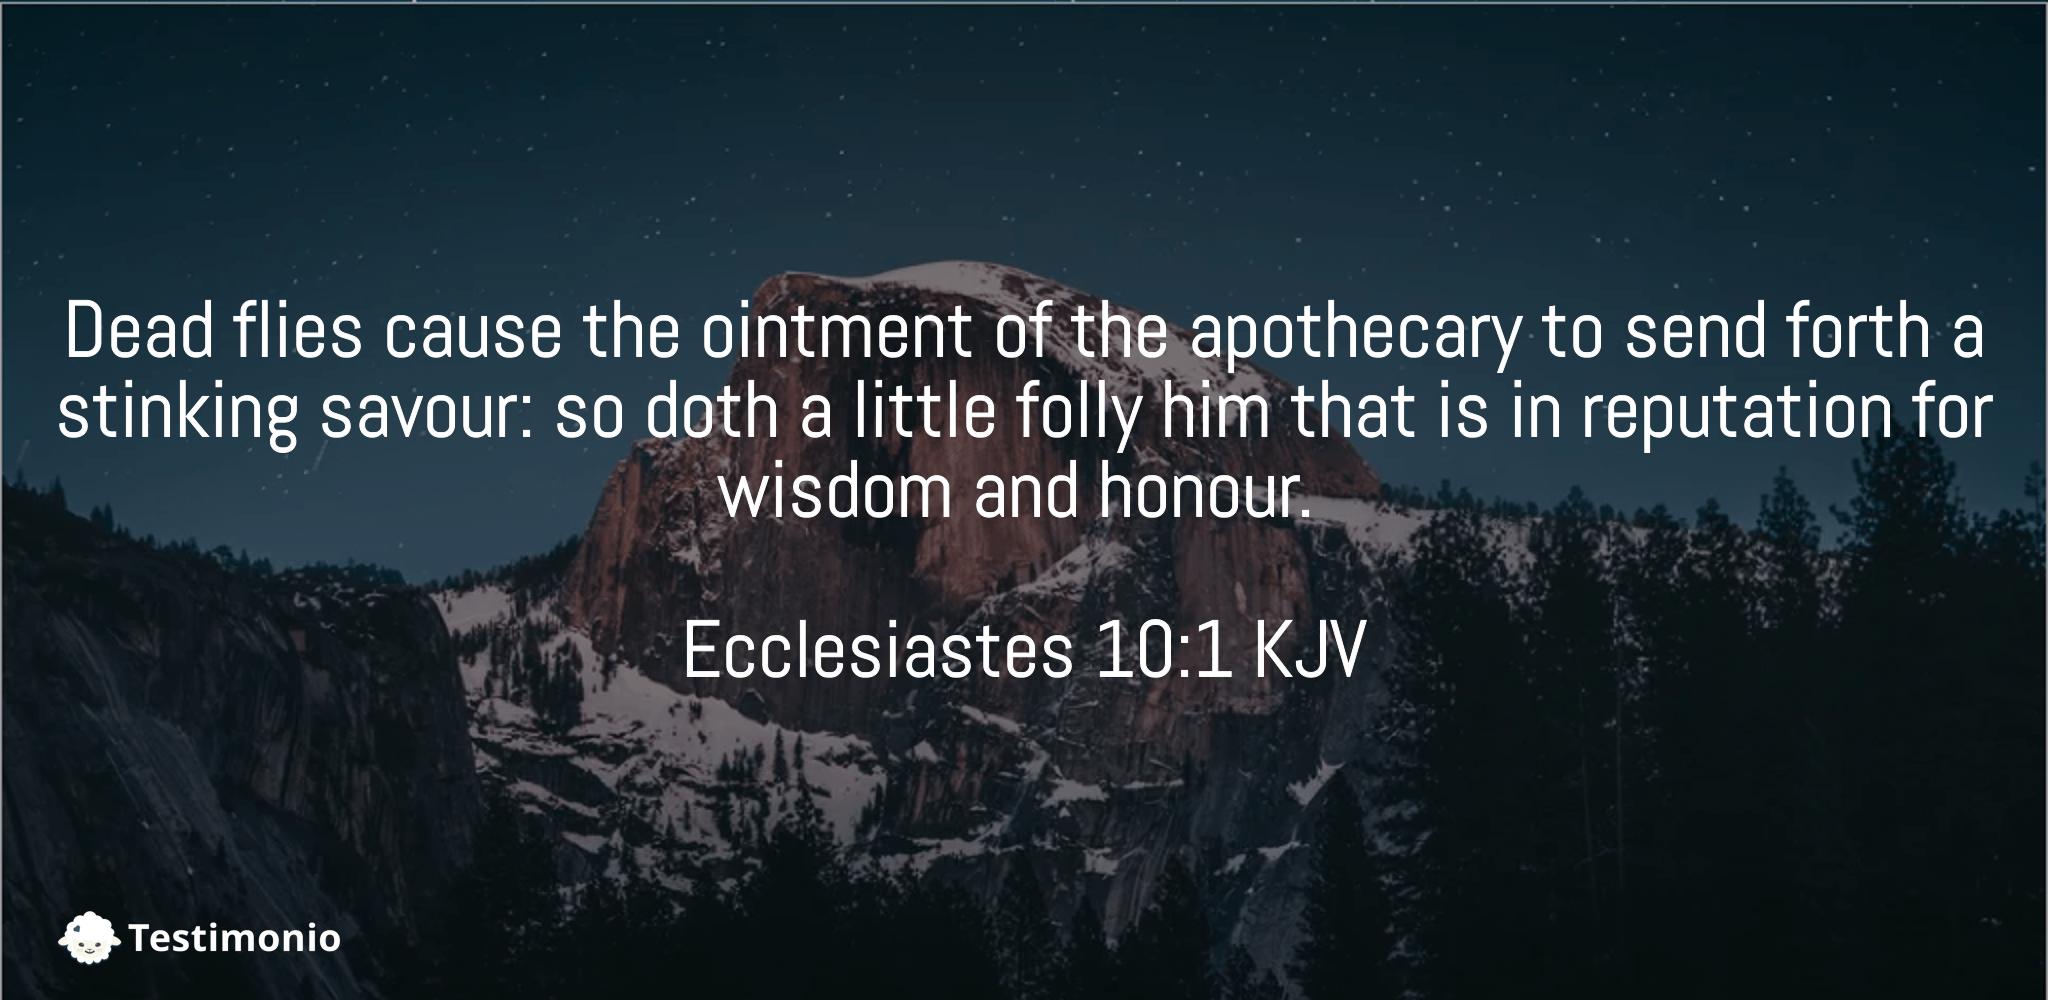 Ecclesiastes 10:1